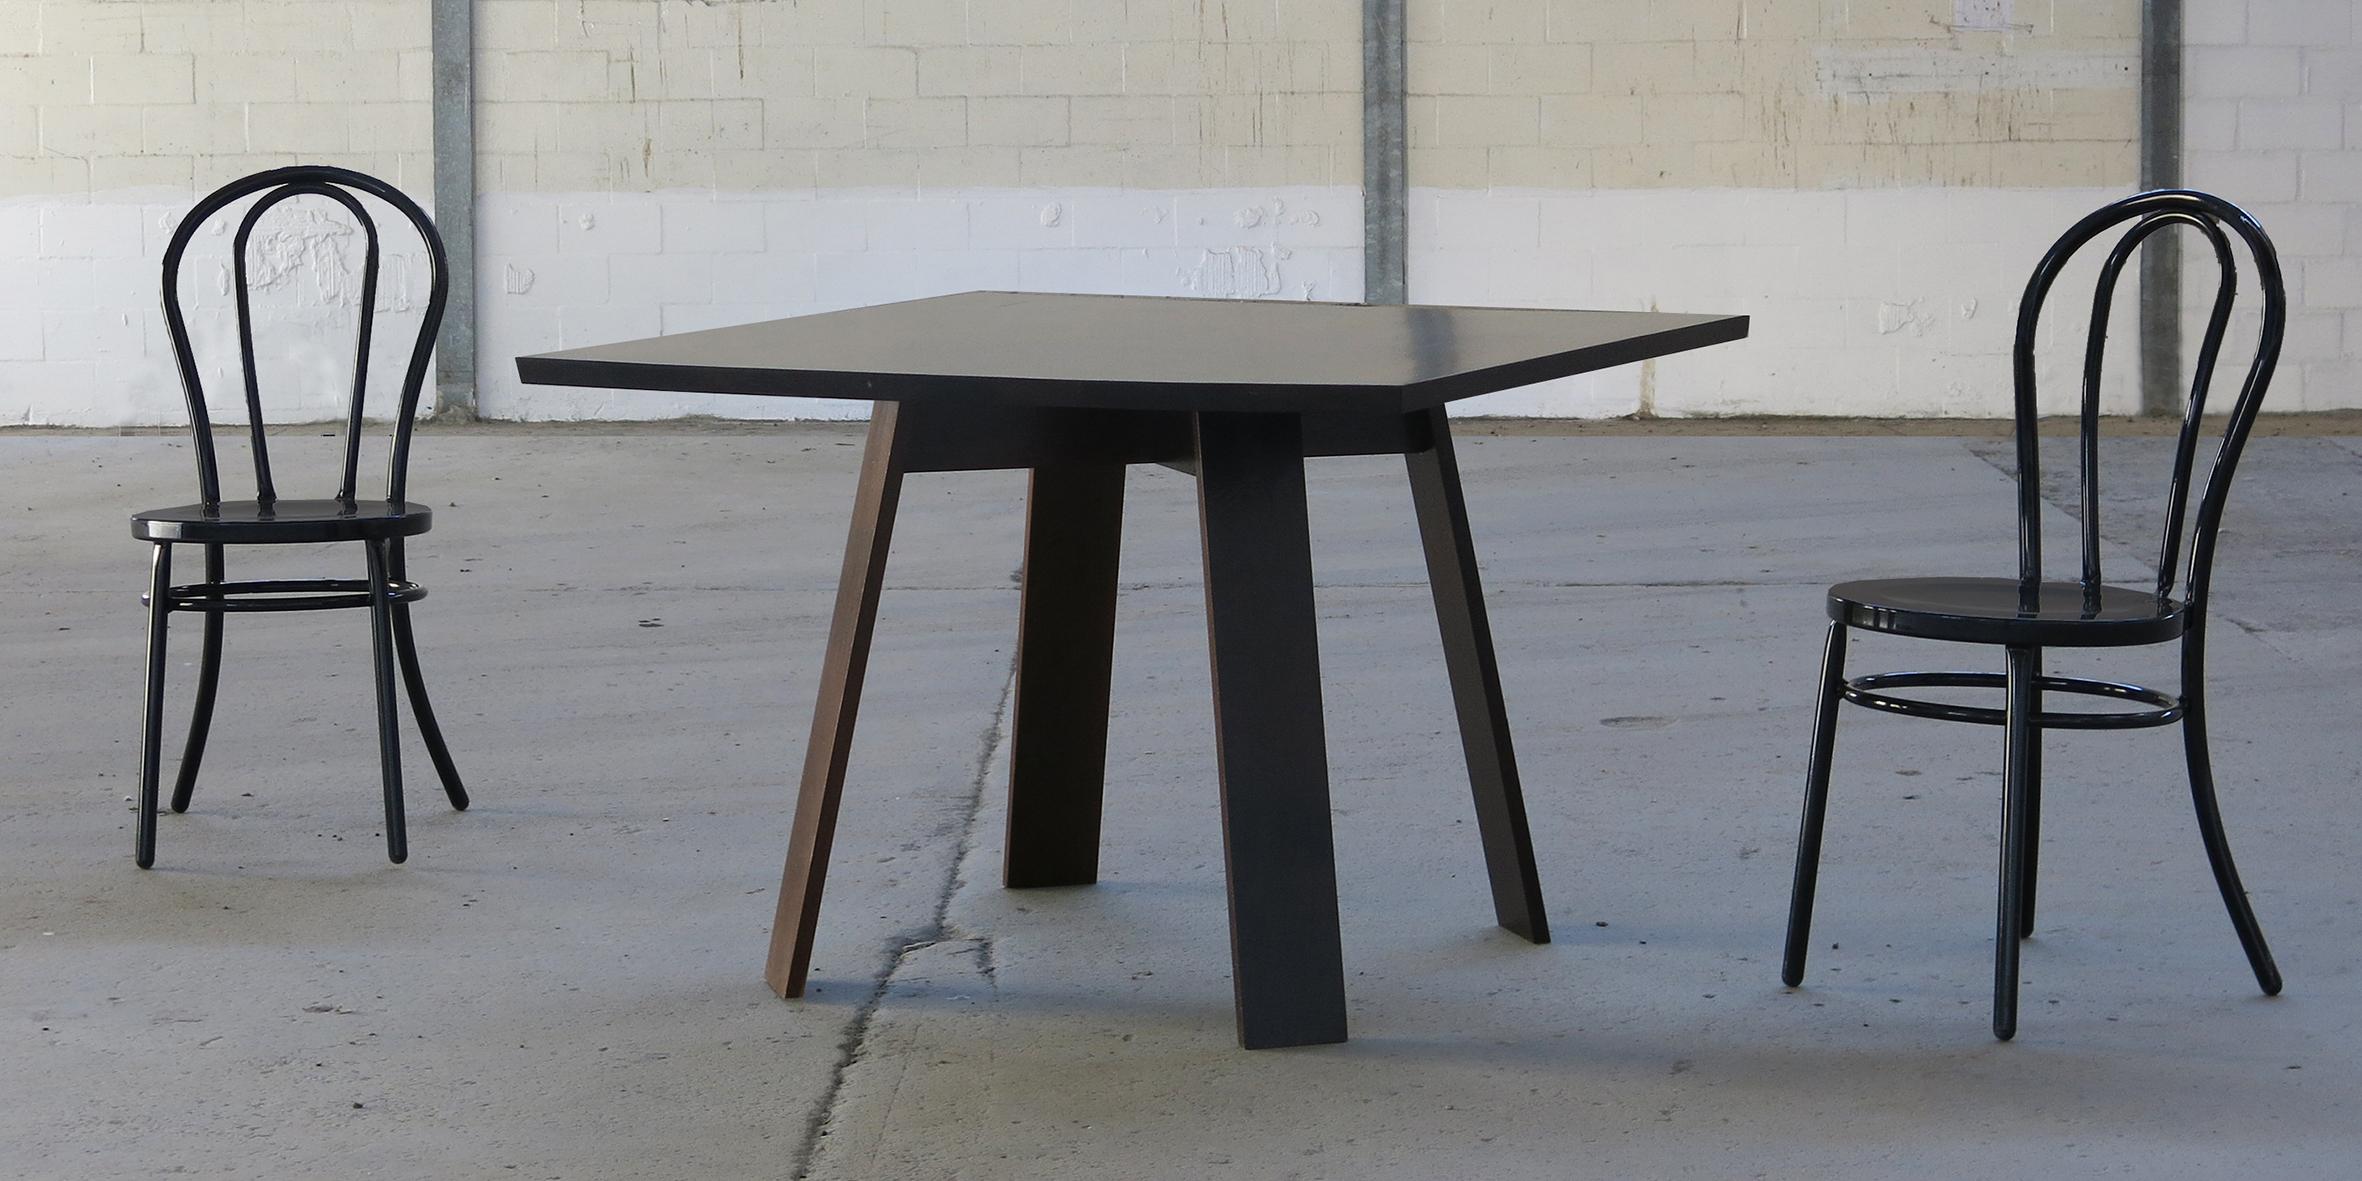 seun table, 1100 l x 1100 w x 730 h, wenge 3